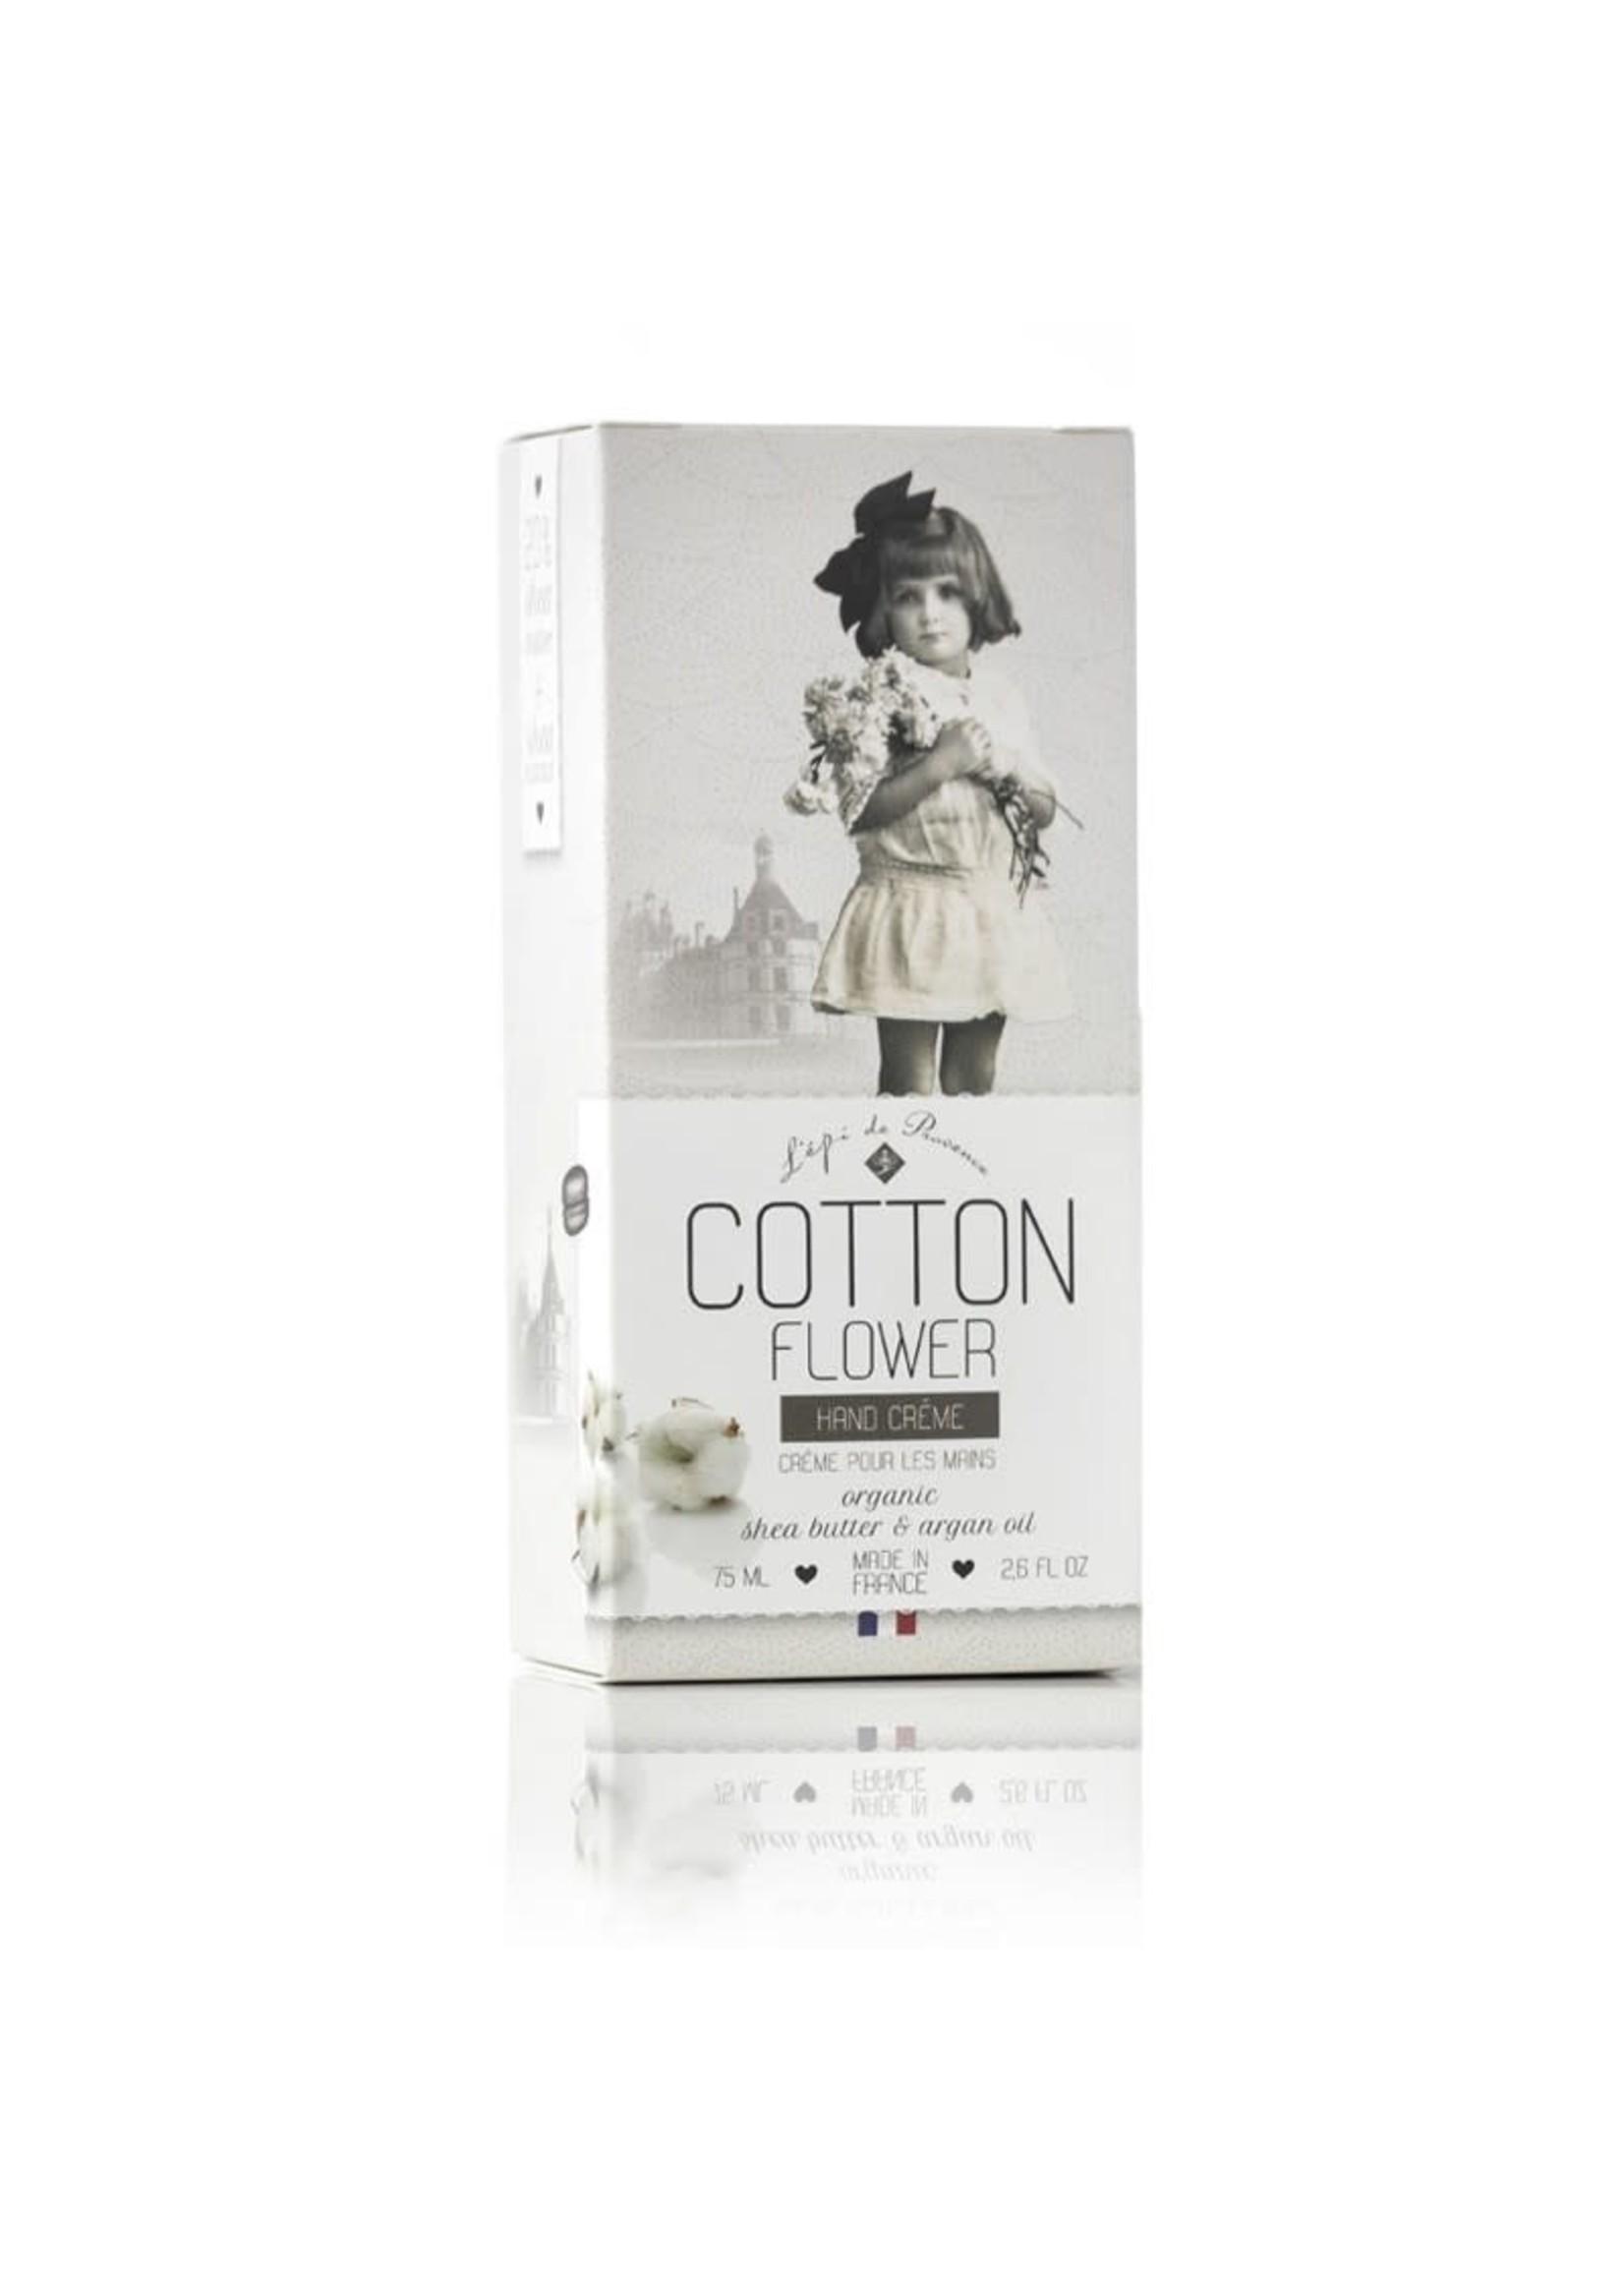 Echo France Soap Cotton Flower 75ml Hand Cream